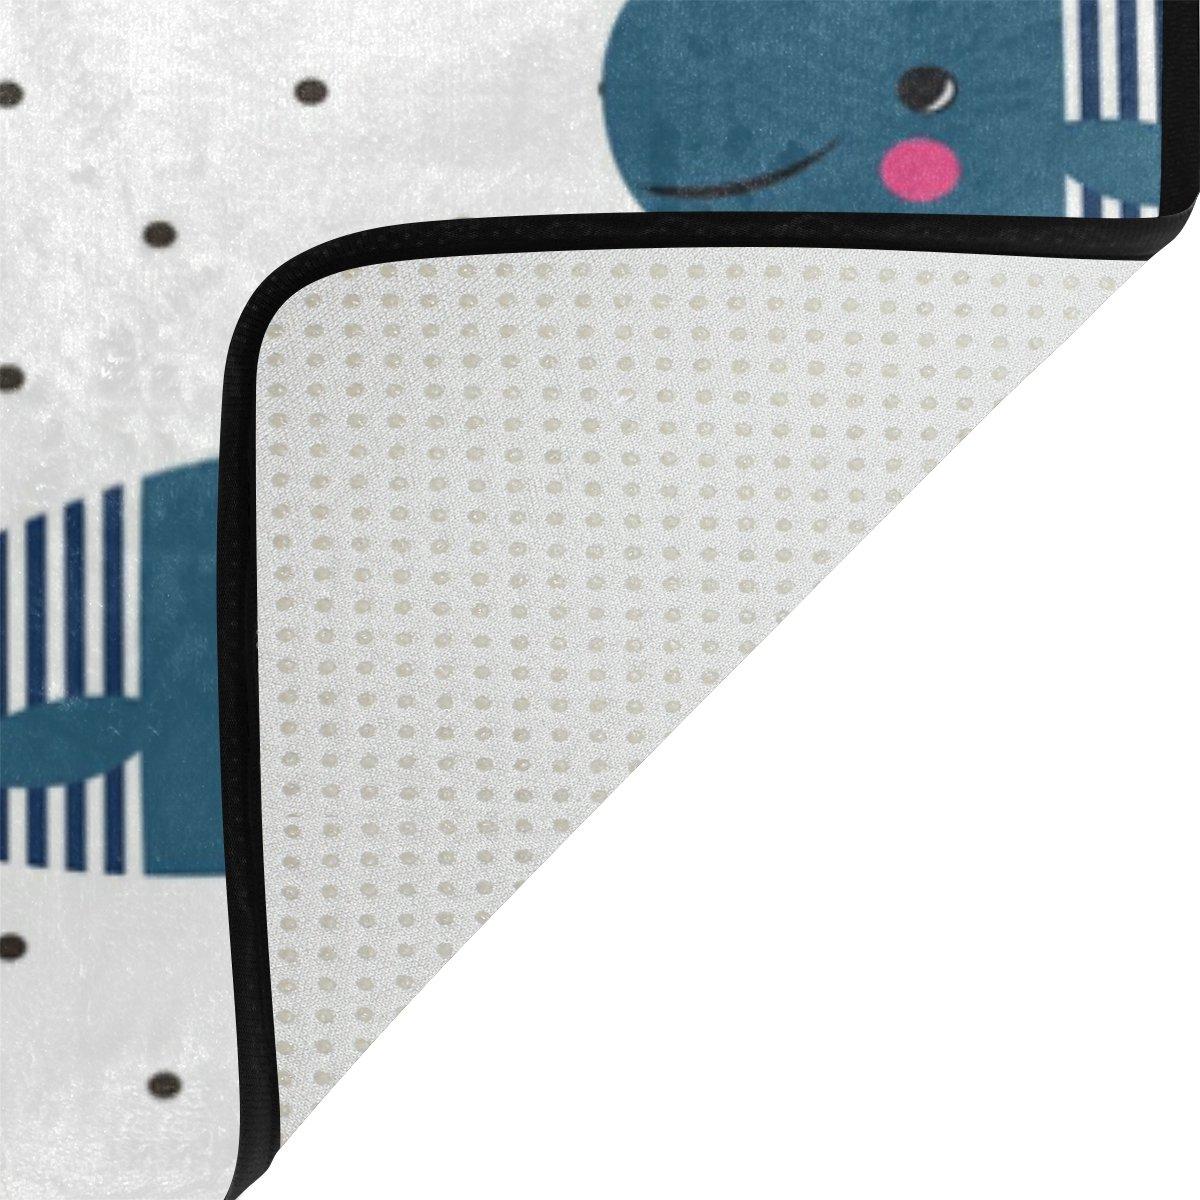 WOZO Cartoon Ocean Sea Animal Whale Polka Dot Area Rug Rugs Non-Slip Floor Mat Doormats Living Room Bedroom 31 x 20 inches